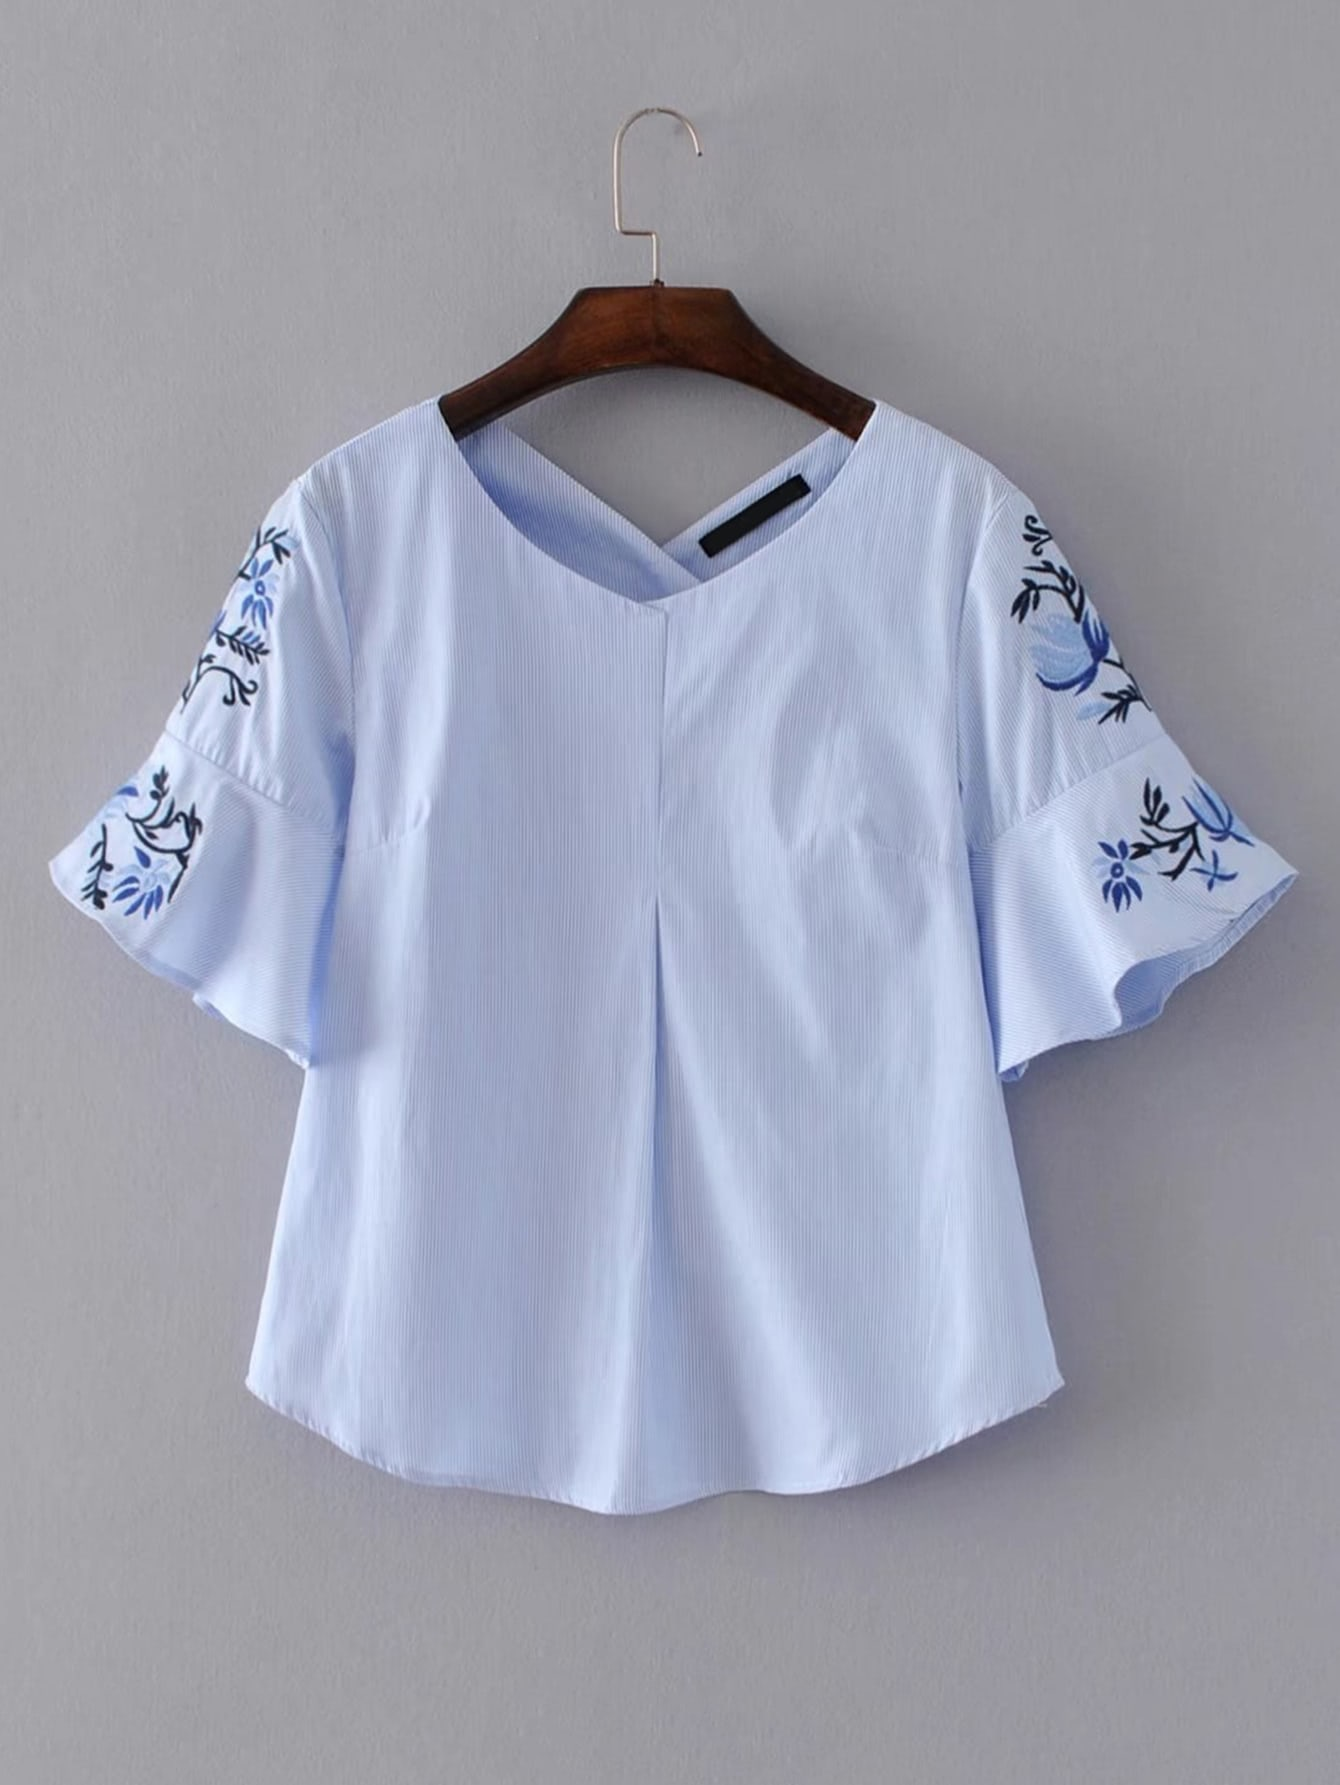 blouse170512206_2